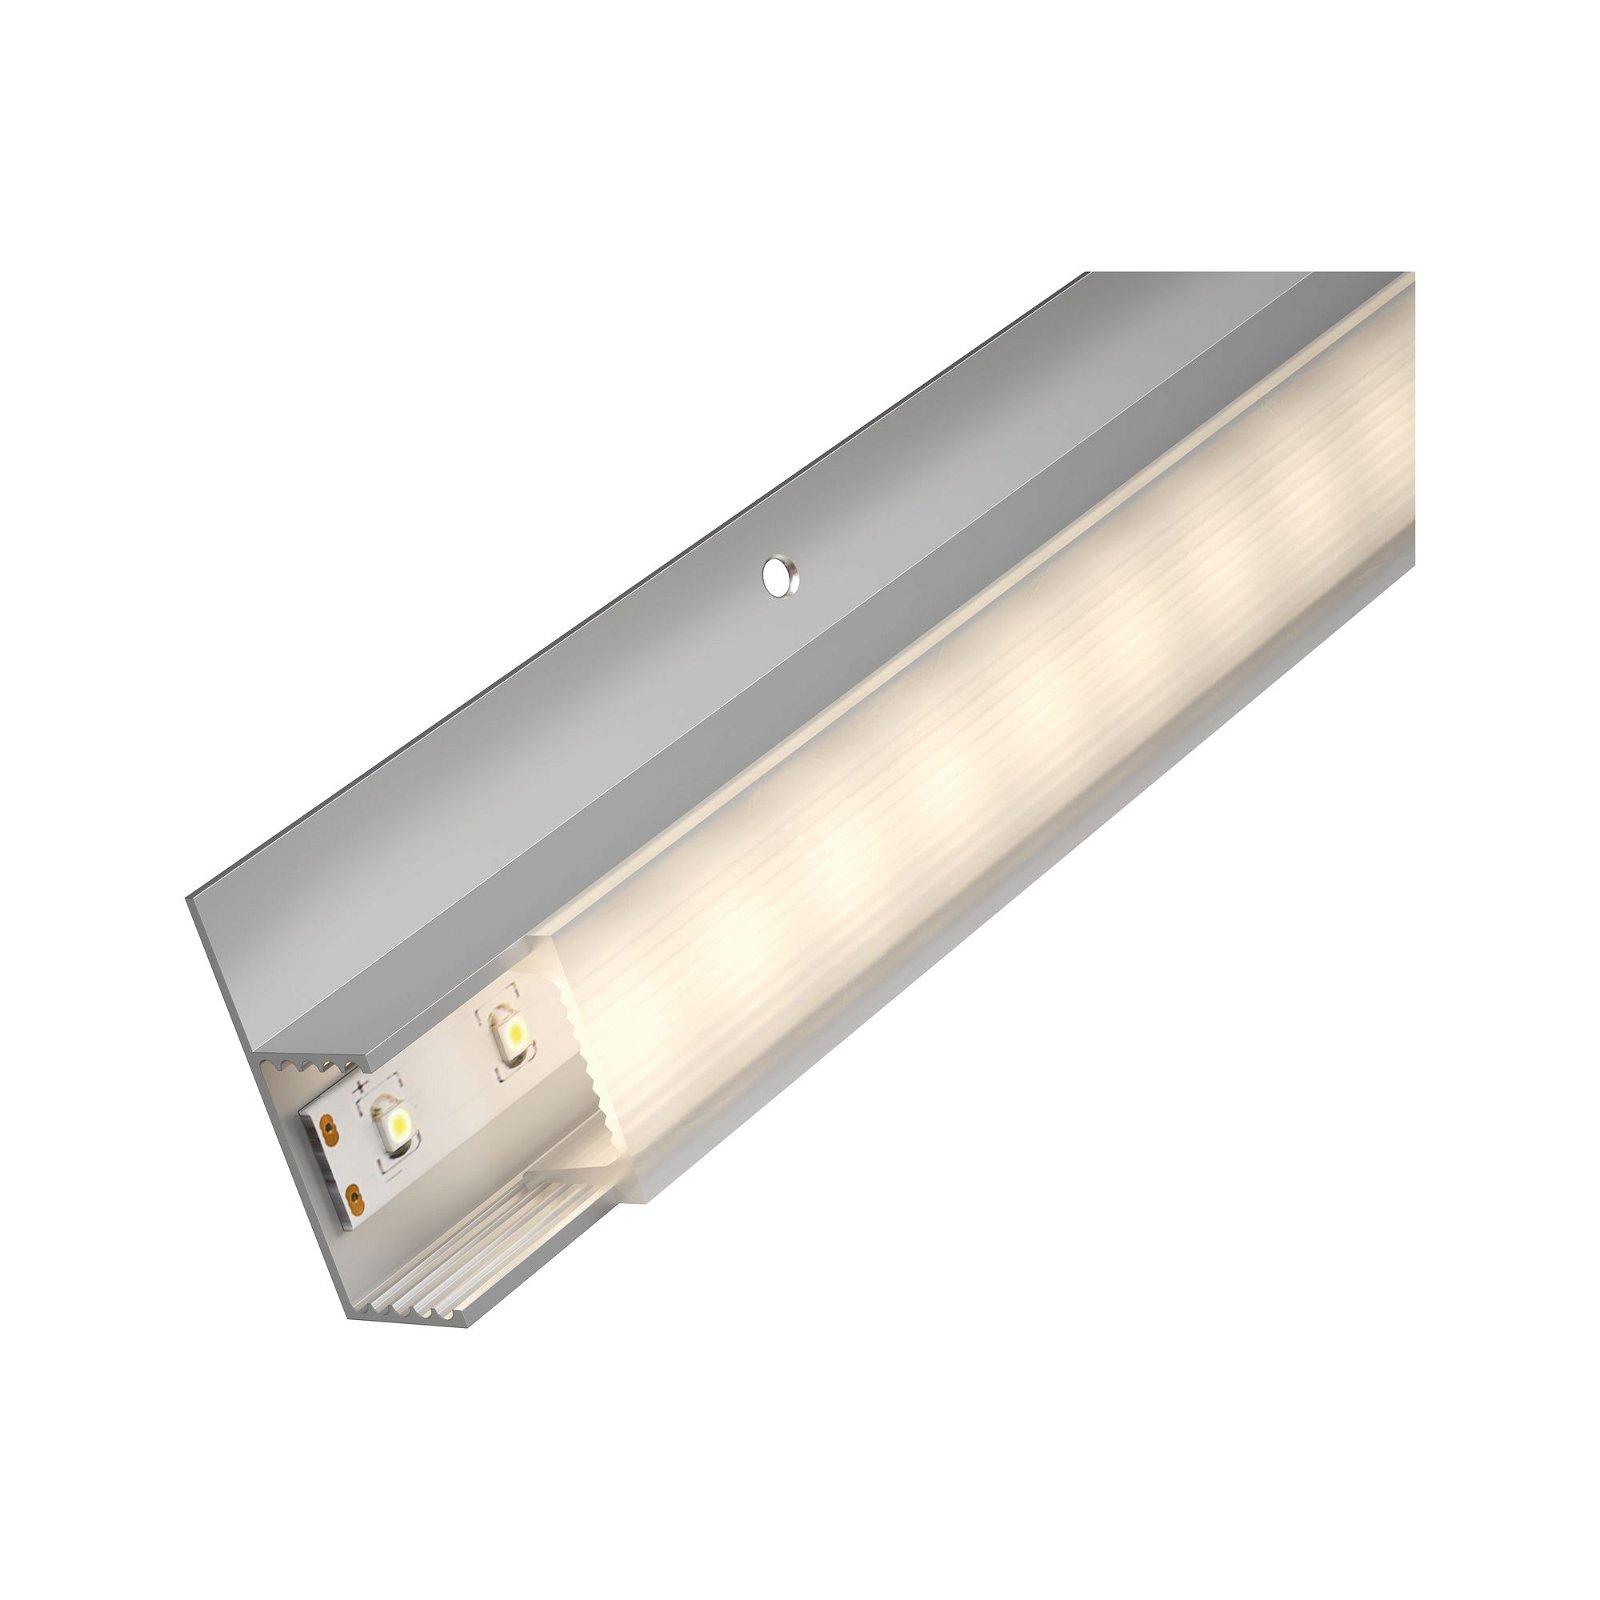 LED Strip Einbauprofil Socle Weißer Diffusor 1m Alu eloxiert/Satin